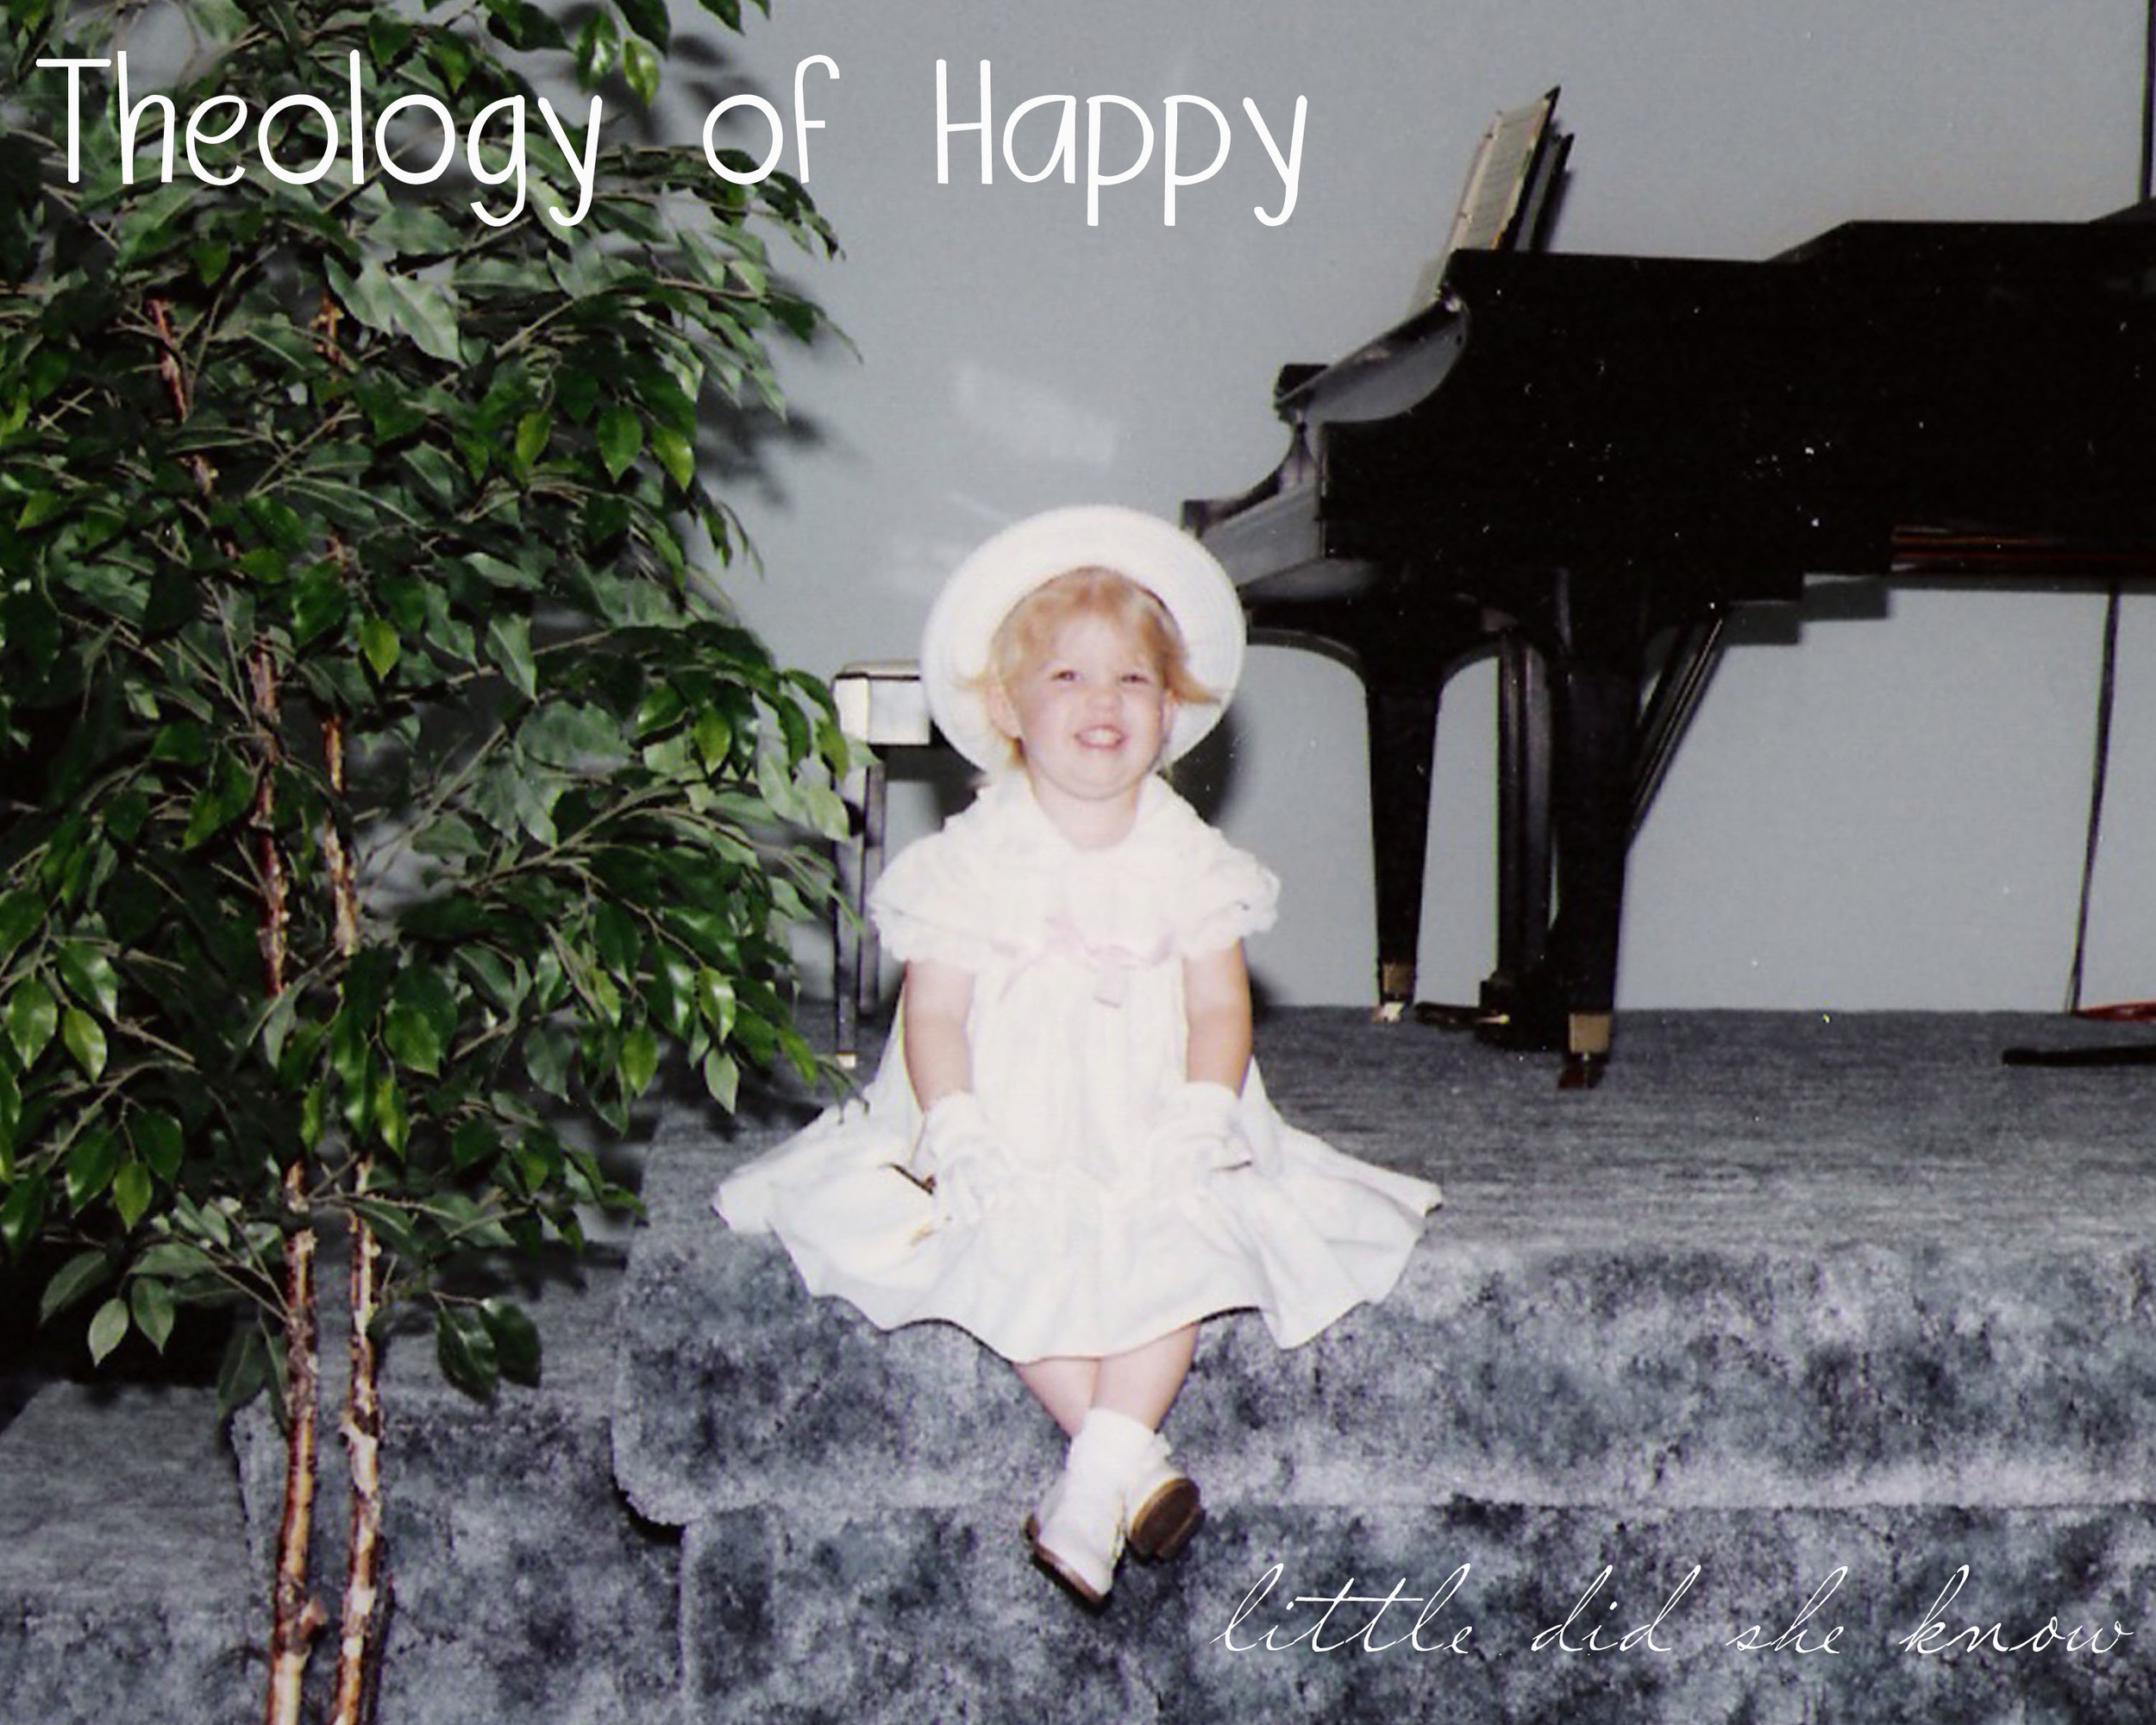 theology of happy